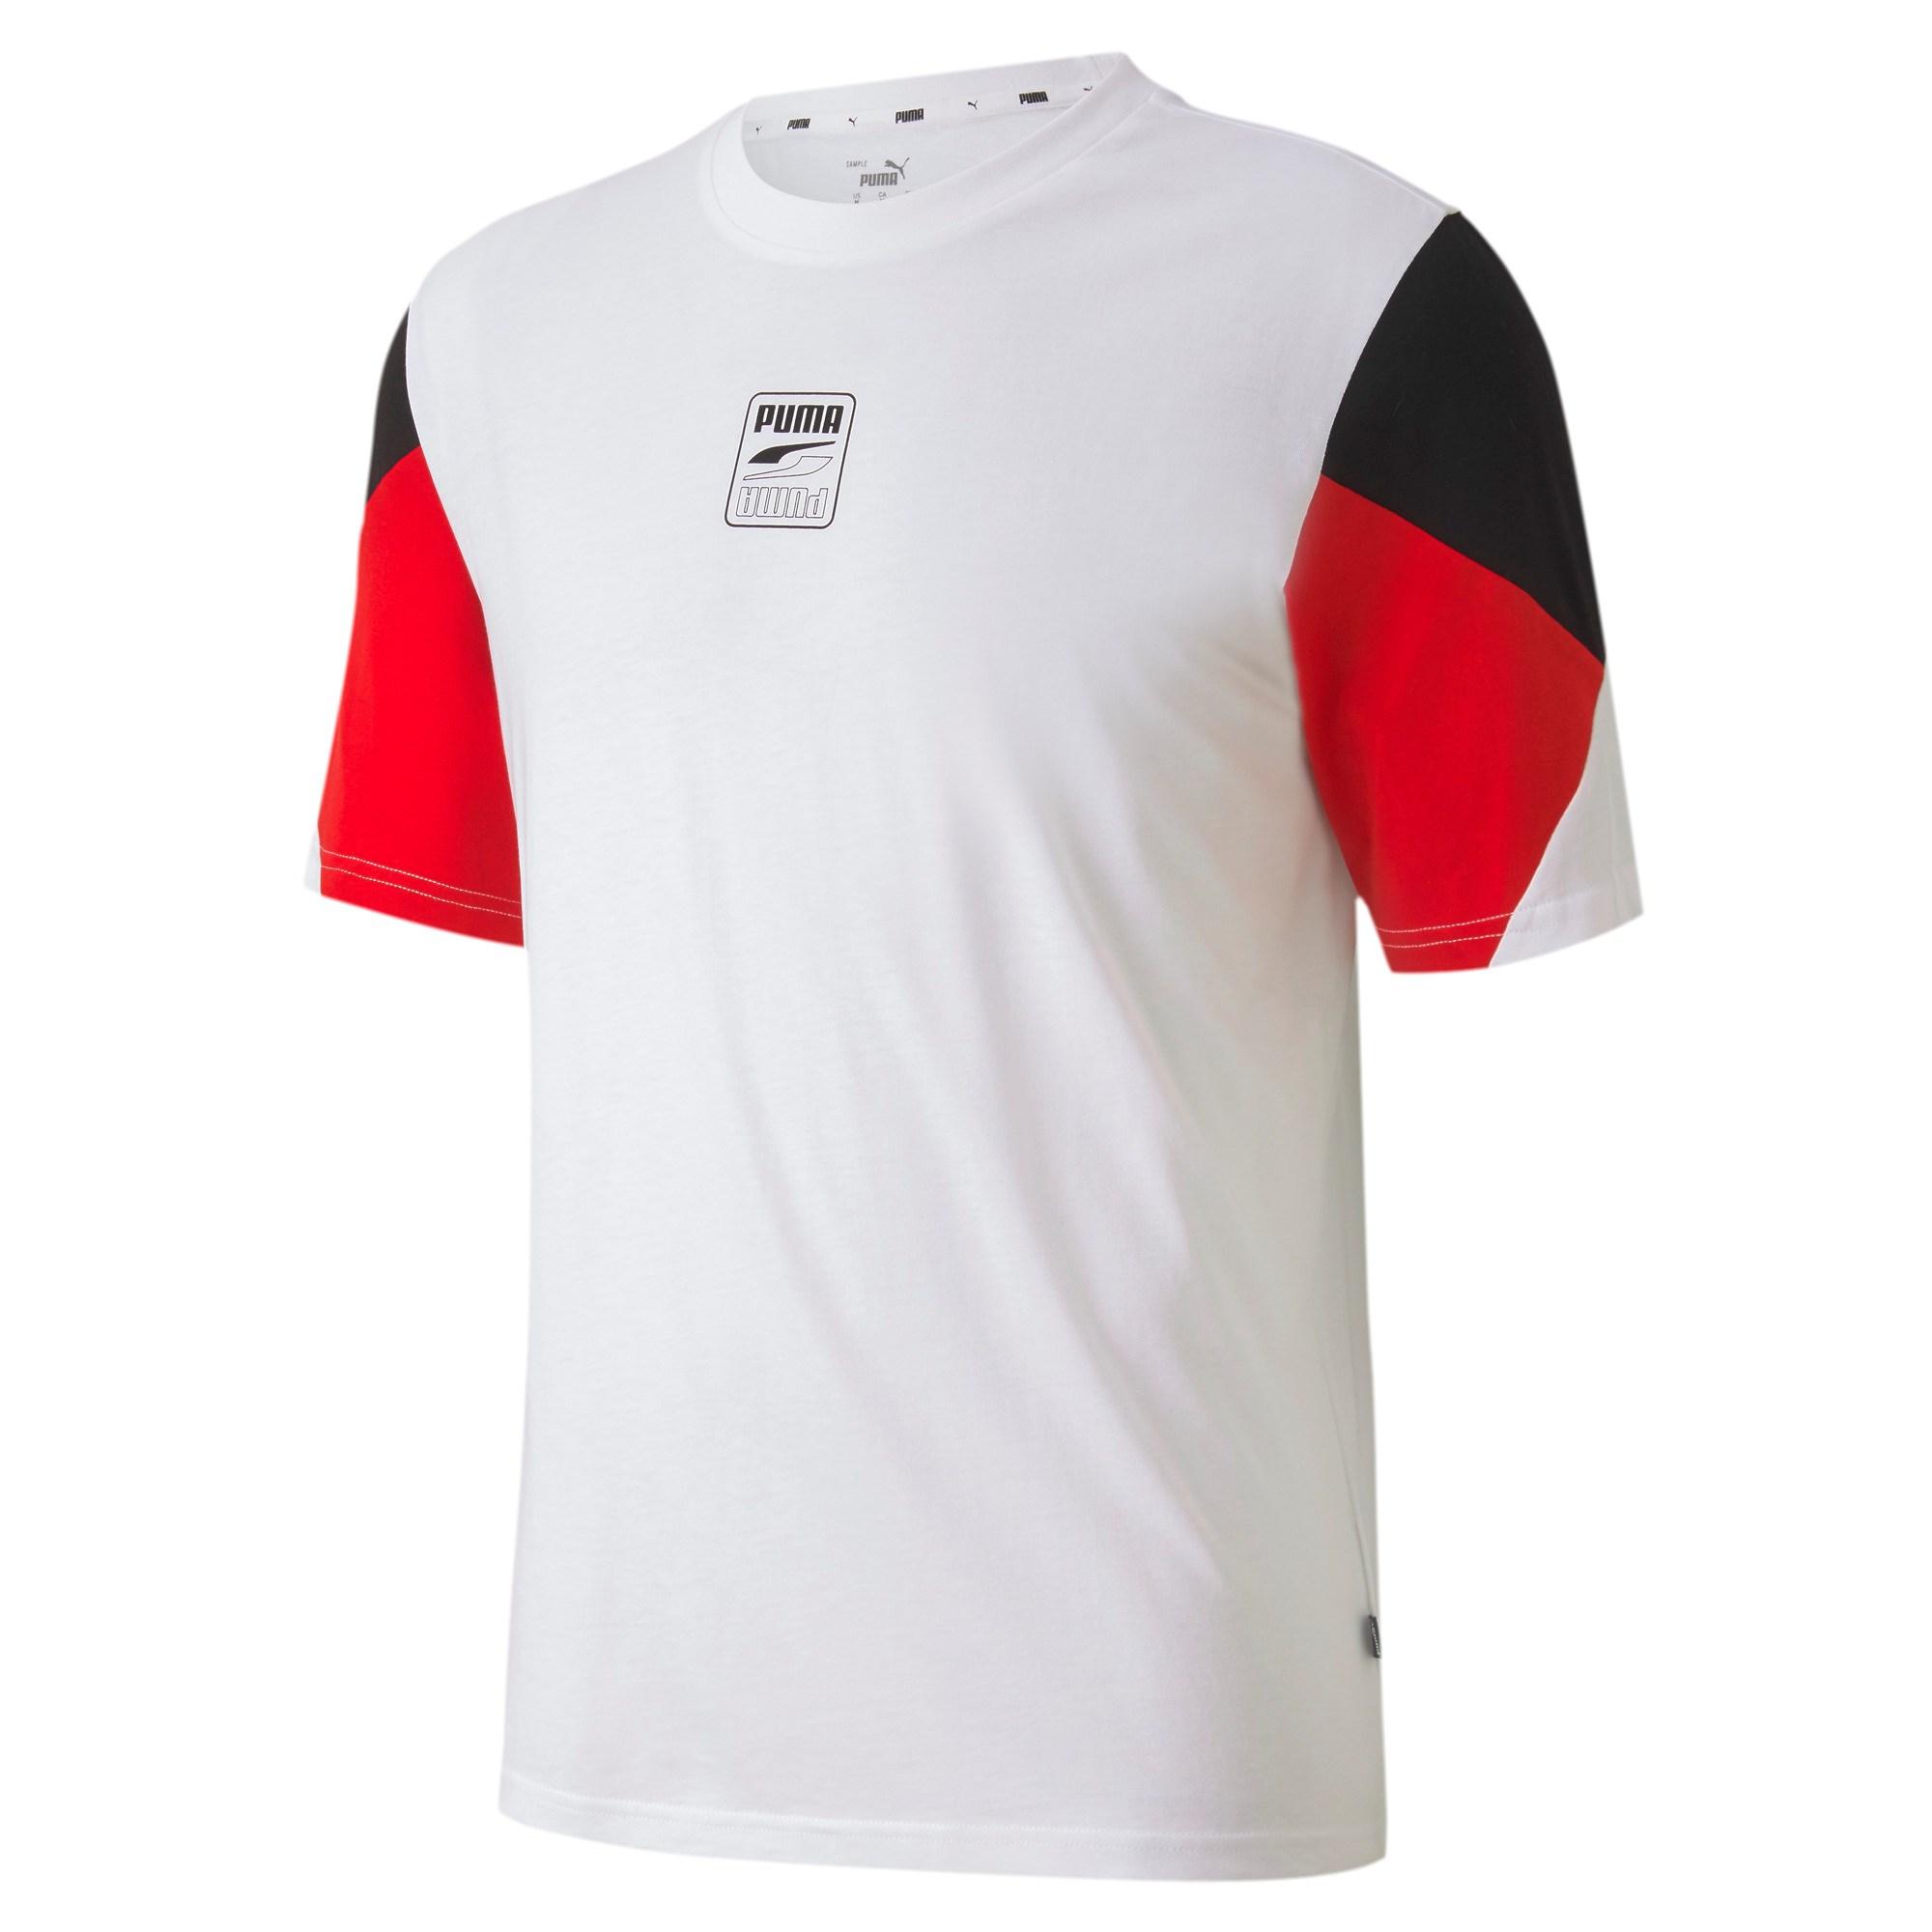 Camiseta Puma Rebel Advanced 02